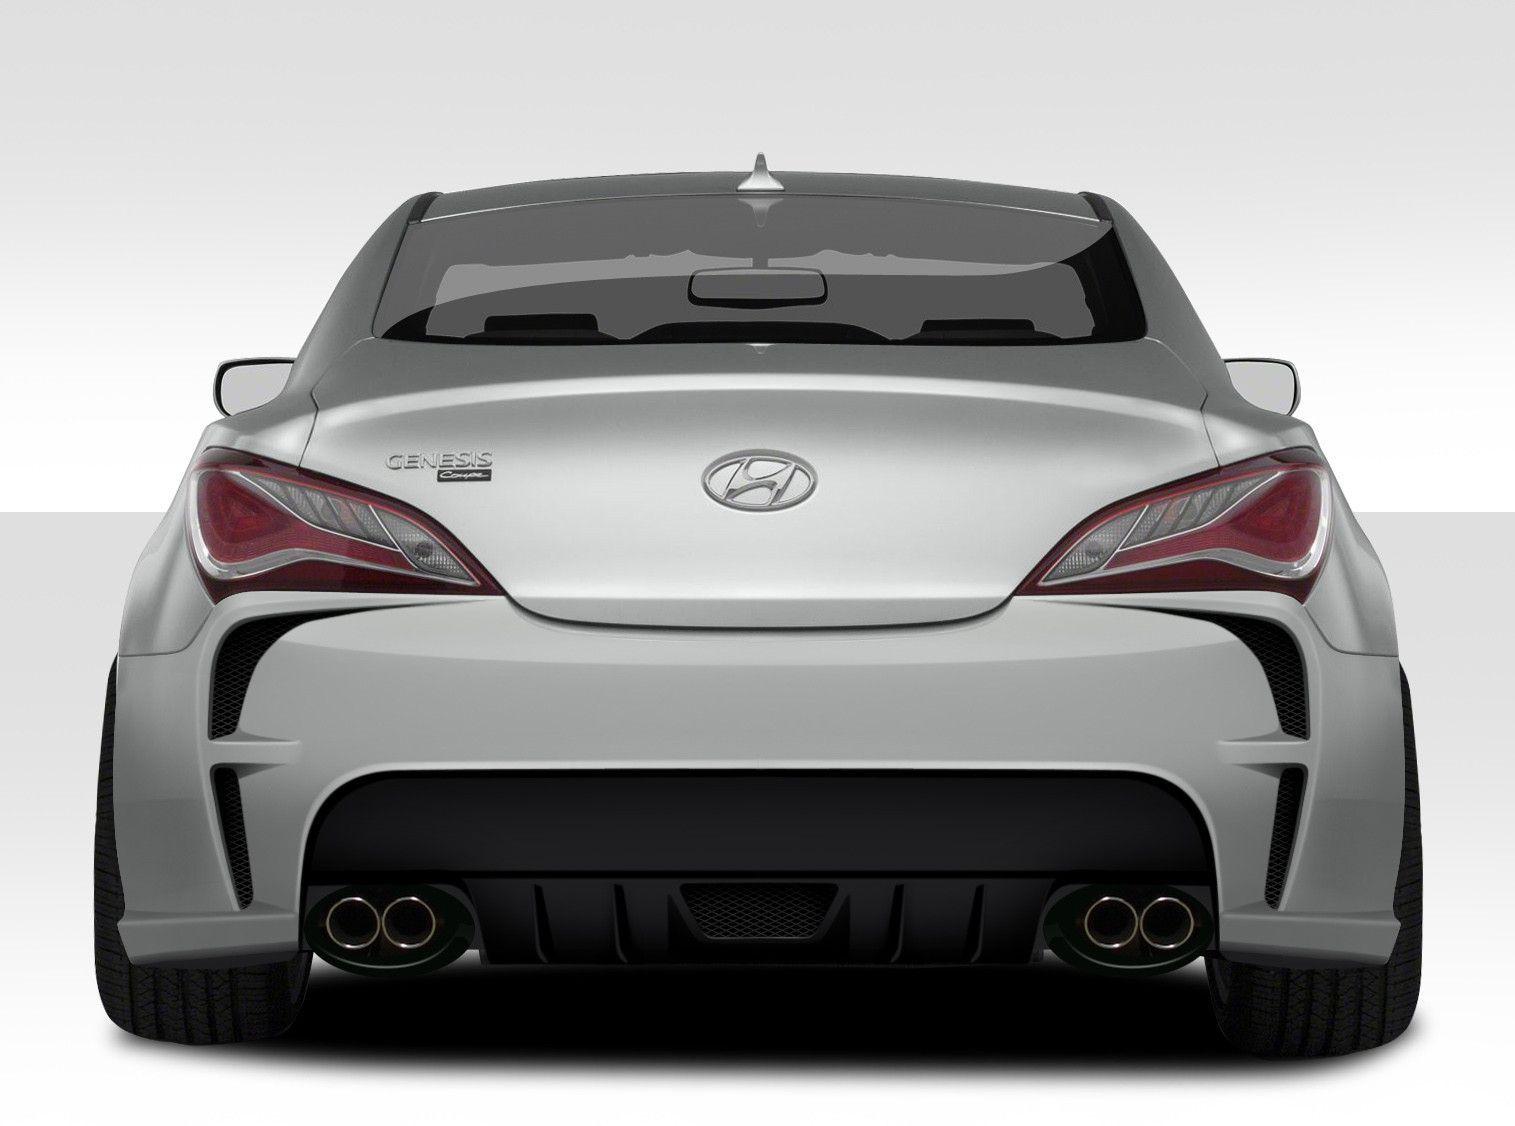 2010 2016 Hyundai Genesis 2dr Duraflex Vg R Rear Bumper Cover 1 Piece Hyundai Genesis Hyundai Genesis Coupe Hyundai